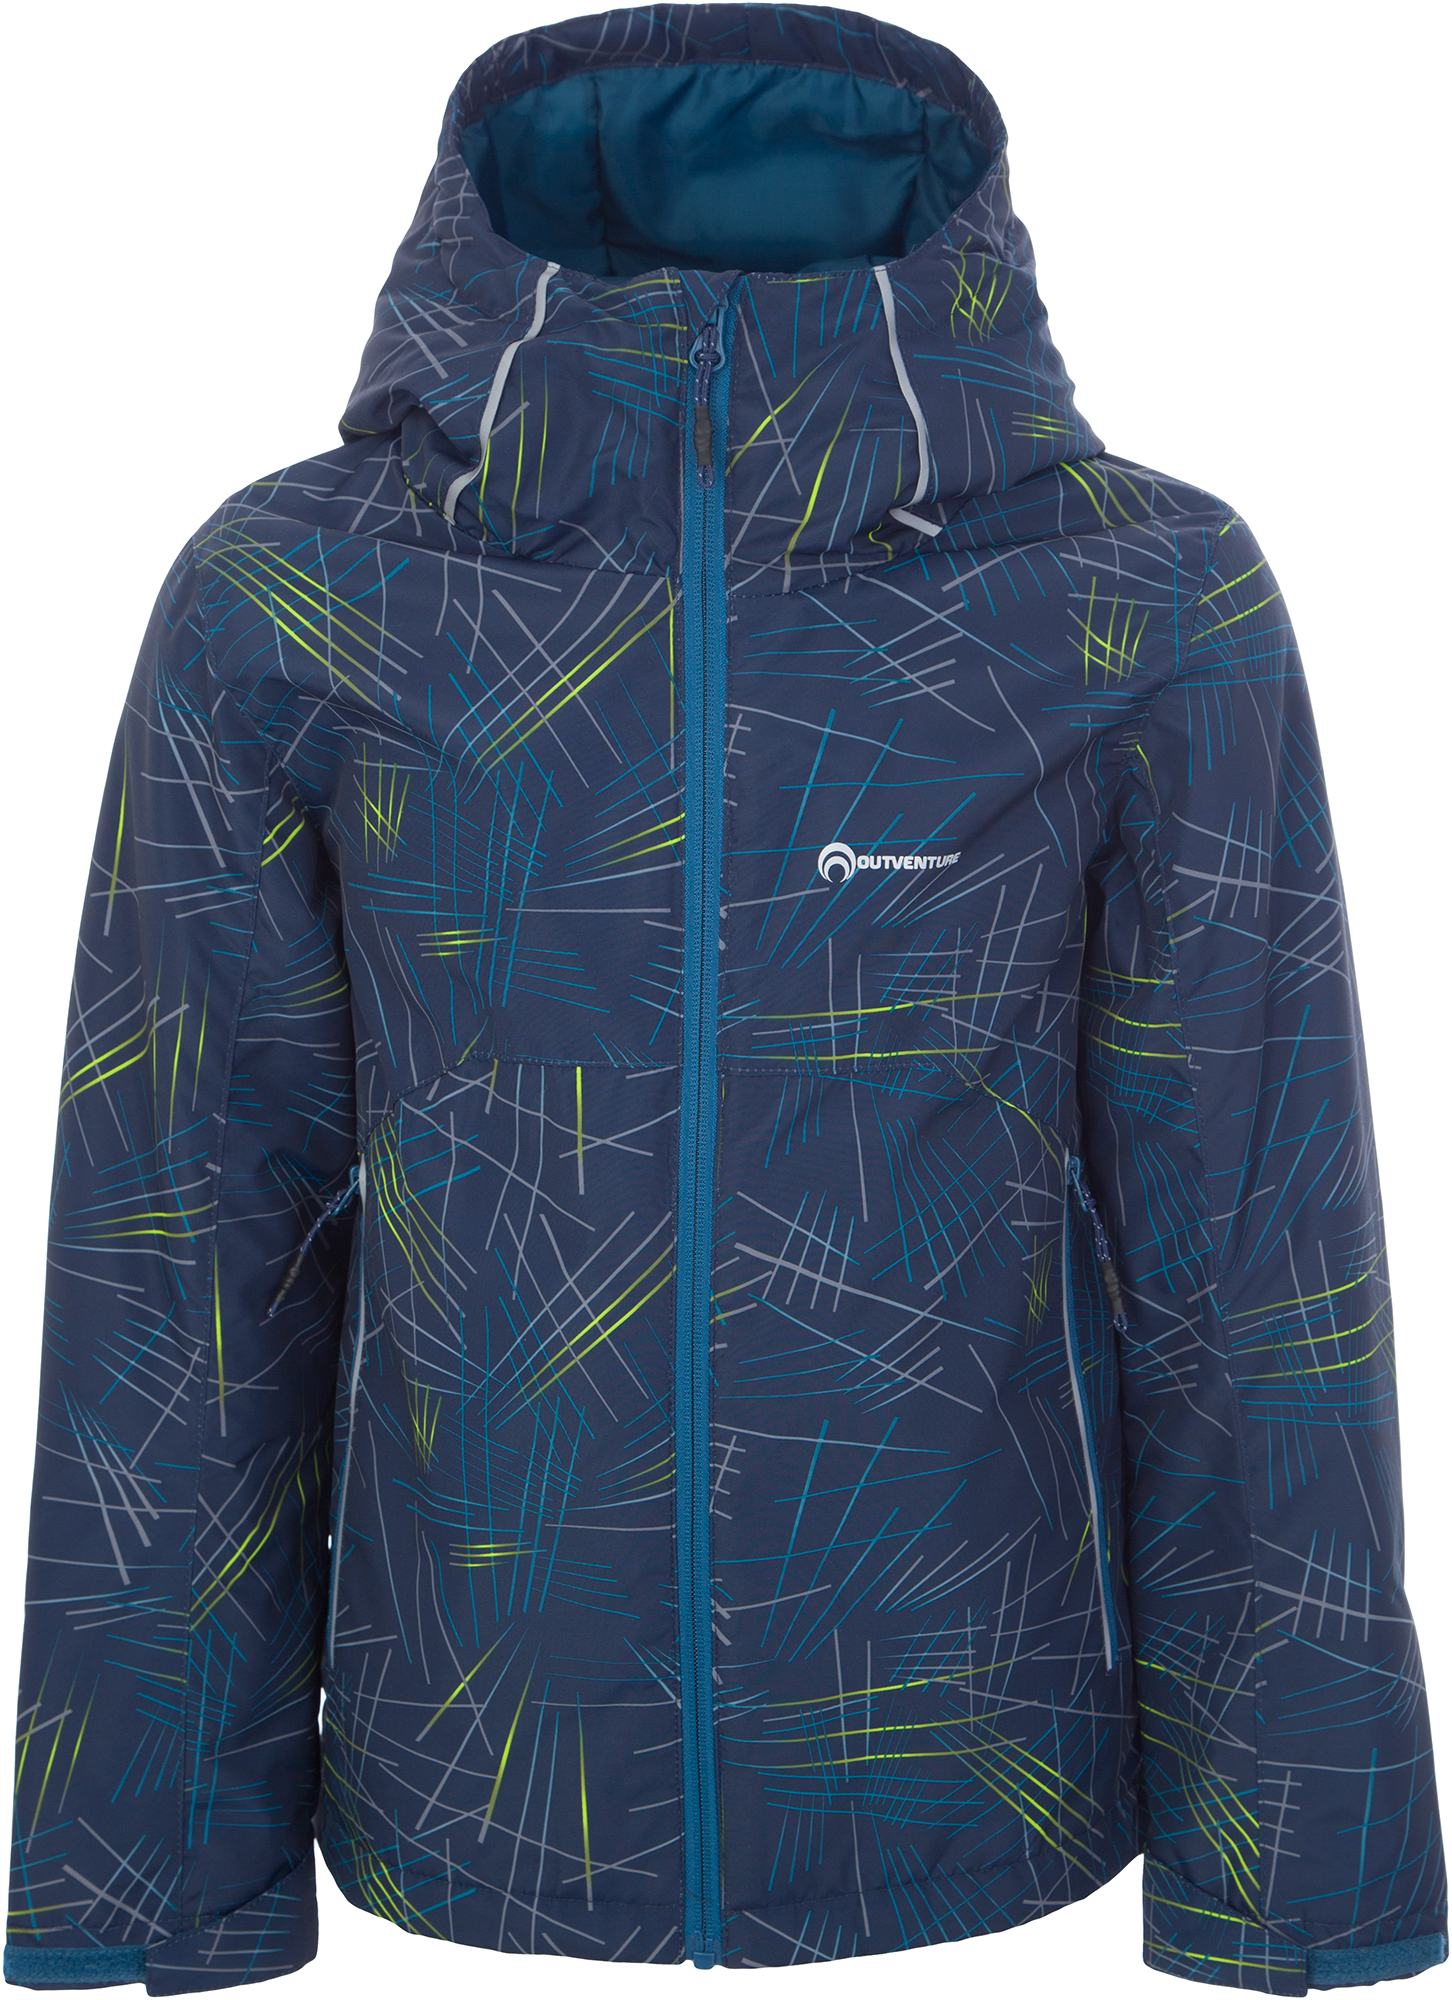 Outventure Куртка для мальчиков Outventure, размер 170